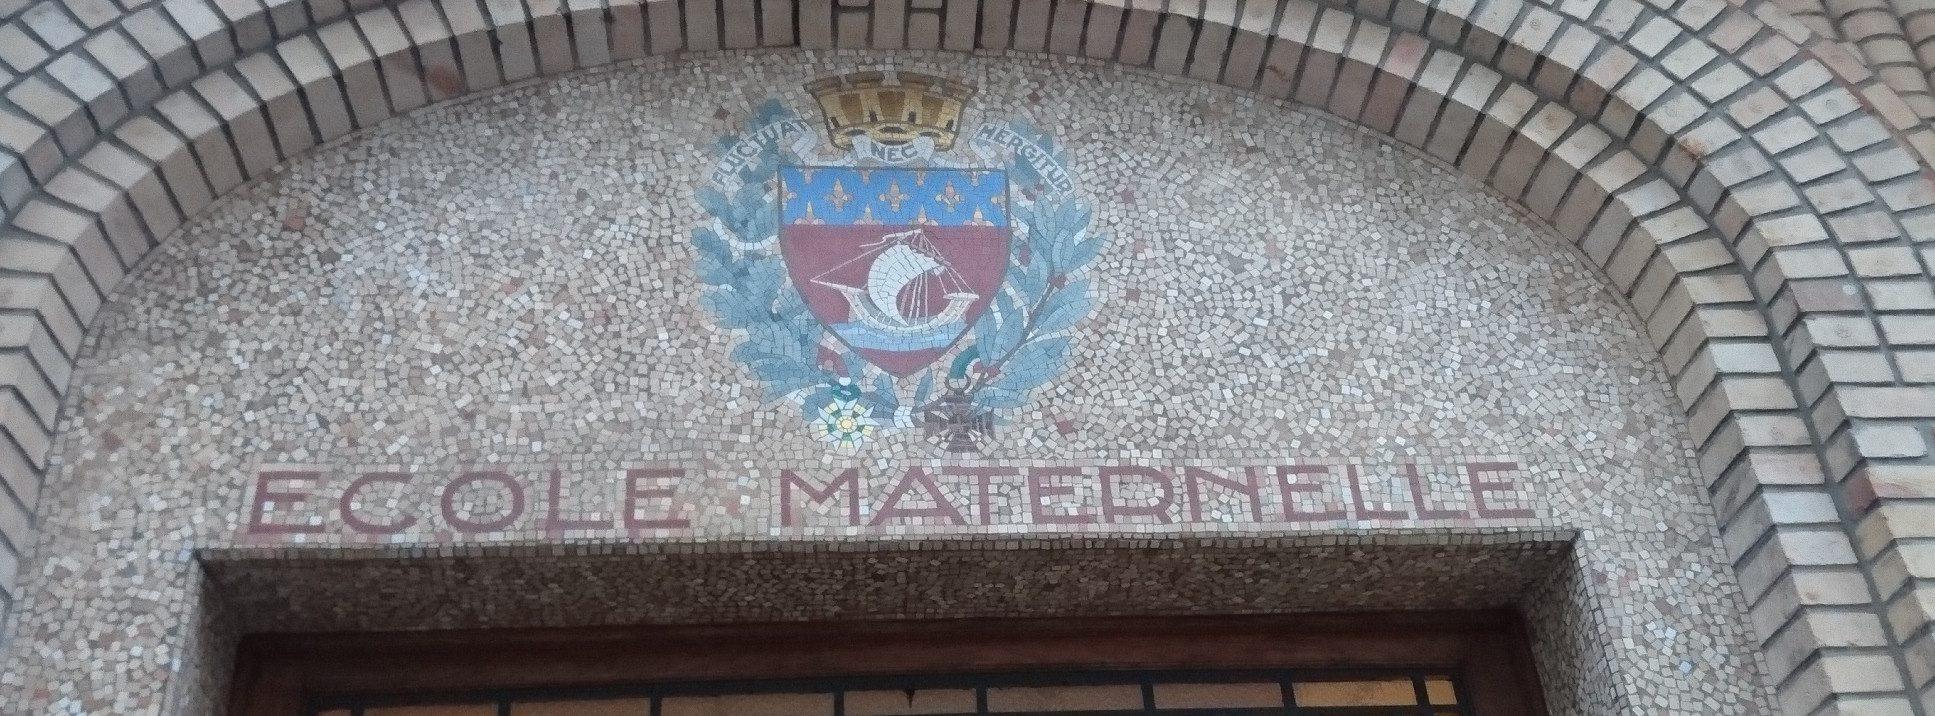 maternelle@ape-madame.fr